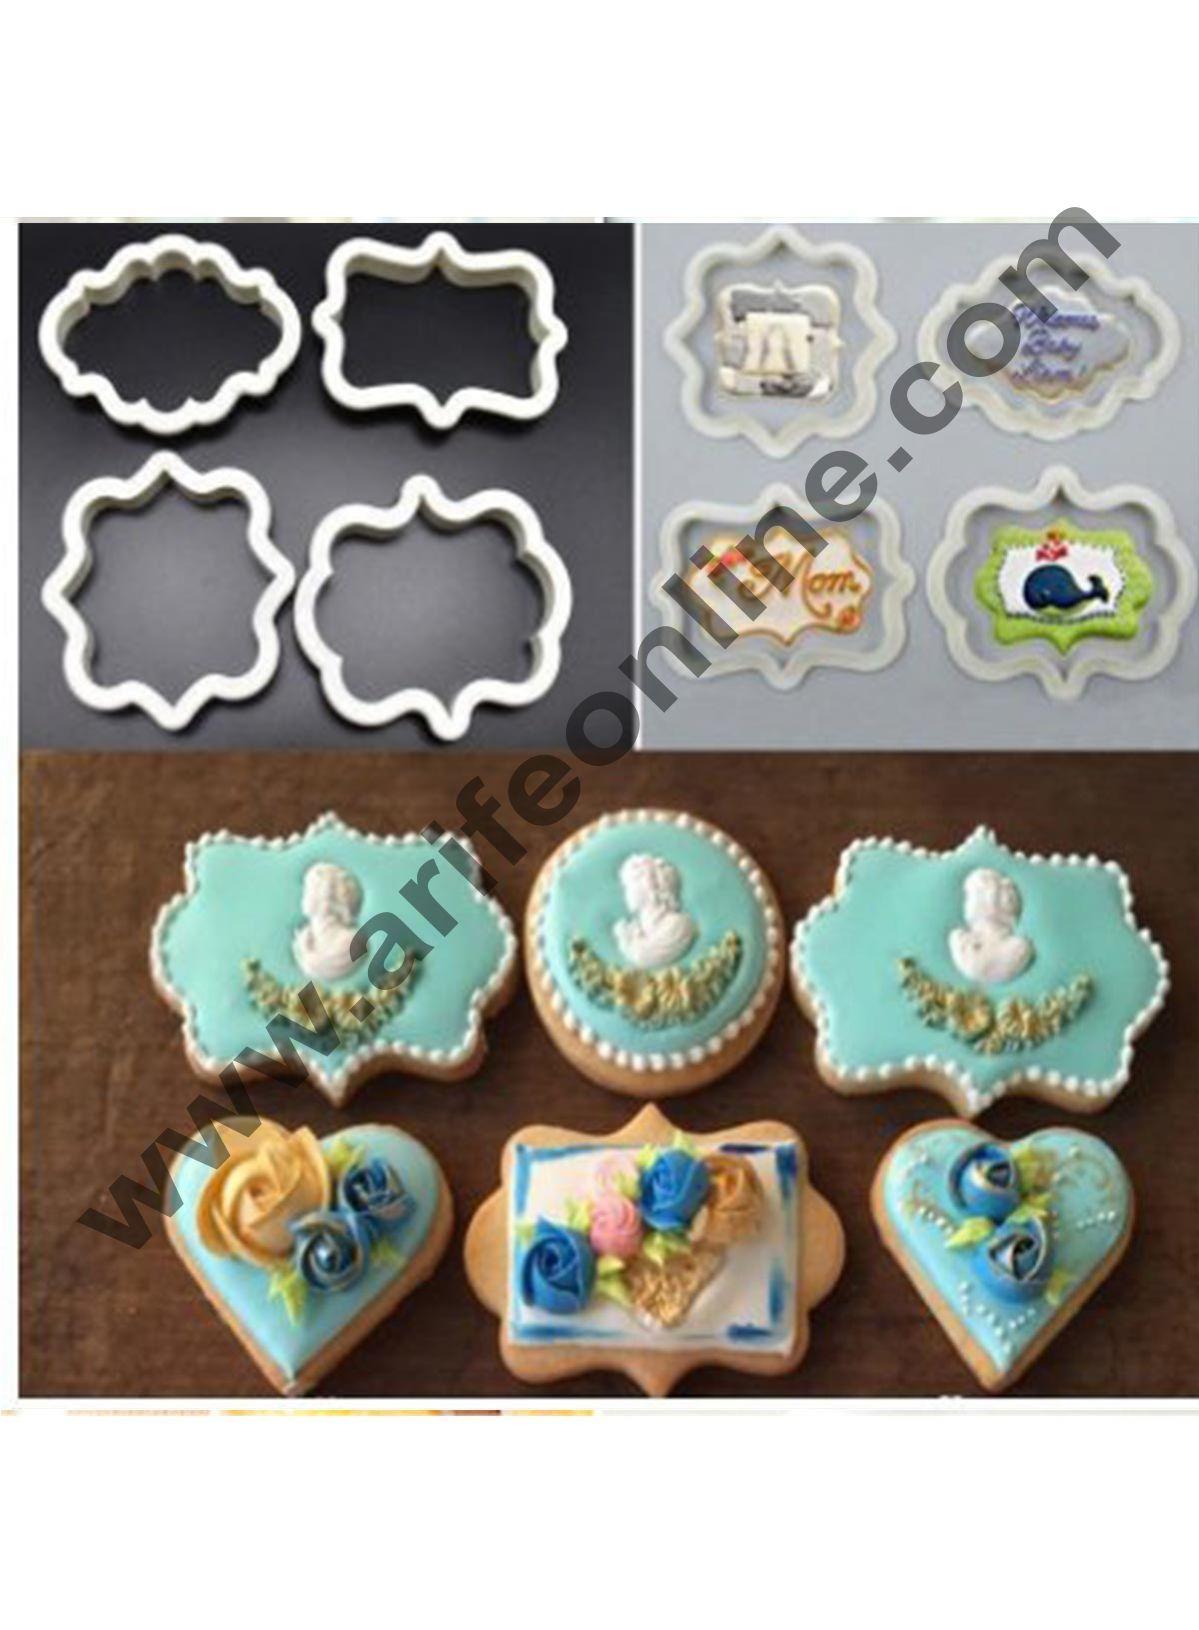 Cake Decor 4pcs Vintage Plaque Frame Cookie Cutter Set Plastic Biscuit Mould Fondant Cake Decorating Tools